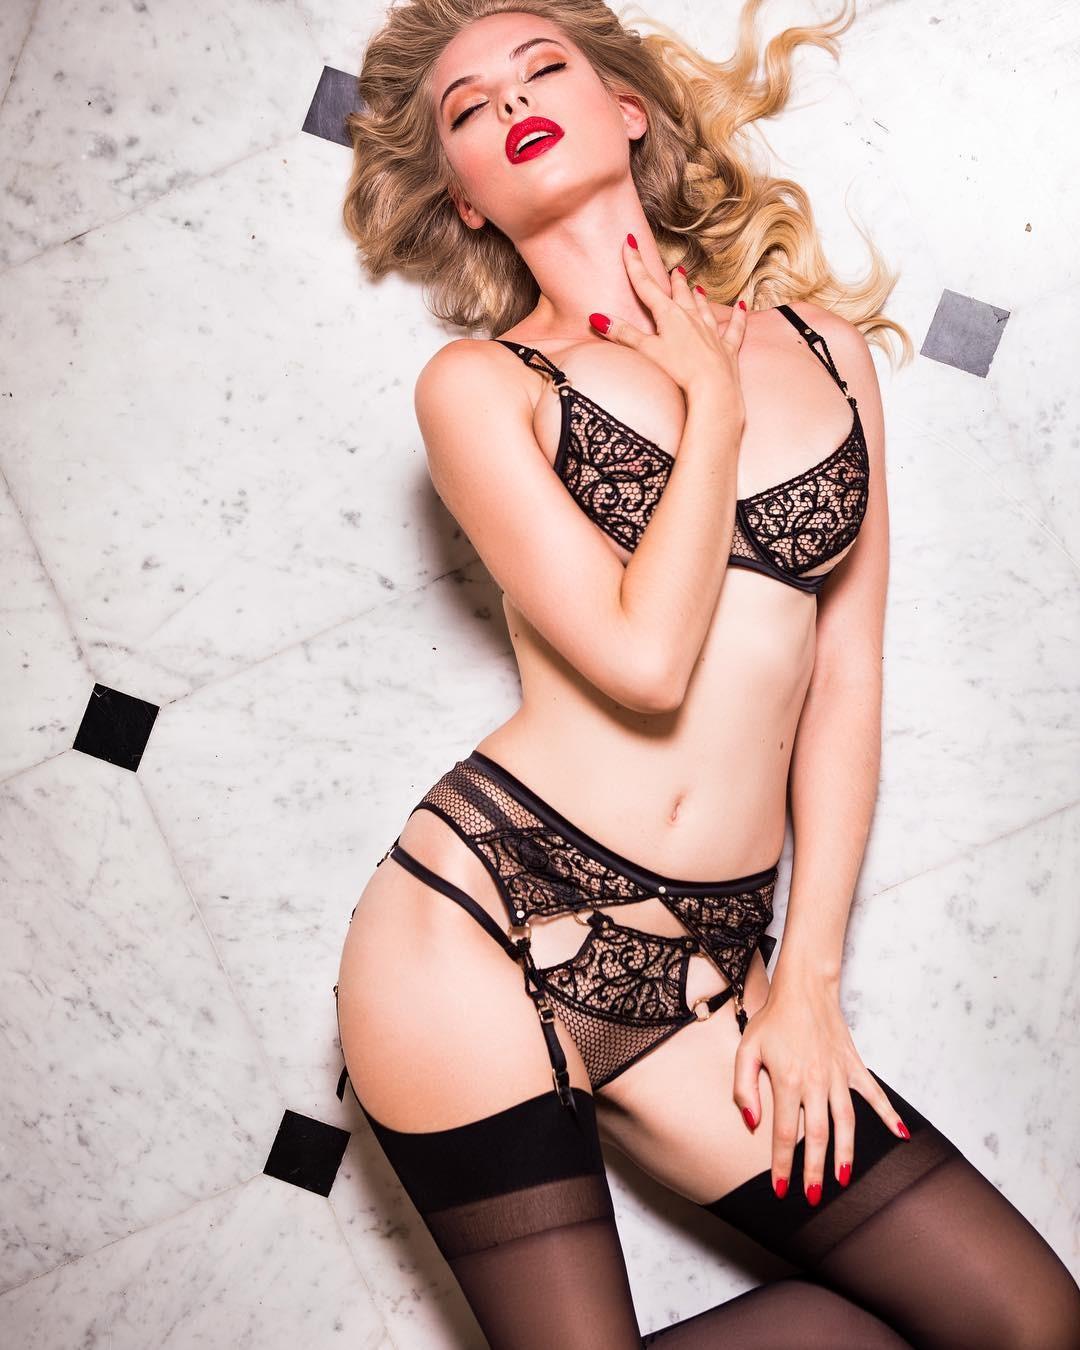 Erotica Dioni Tabbers naked (96 photos), Ass, Sideboobs, Feet, braless 2018